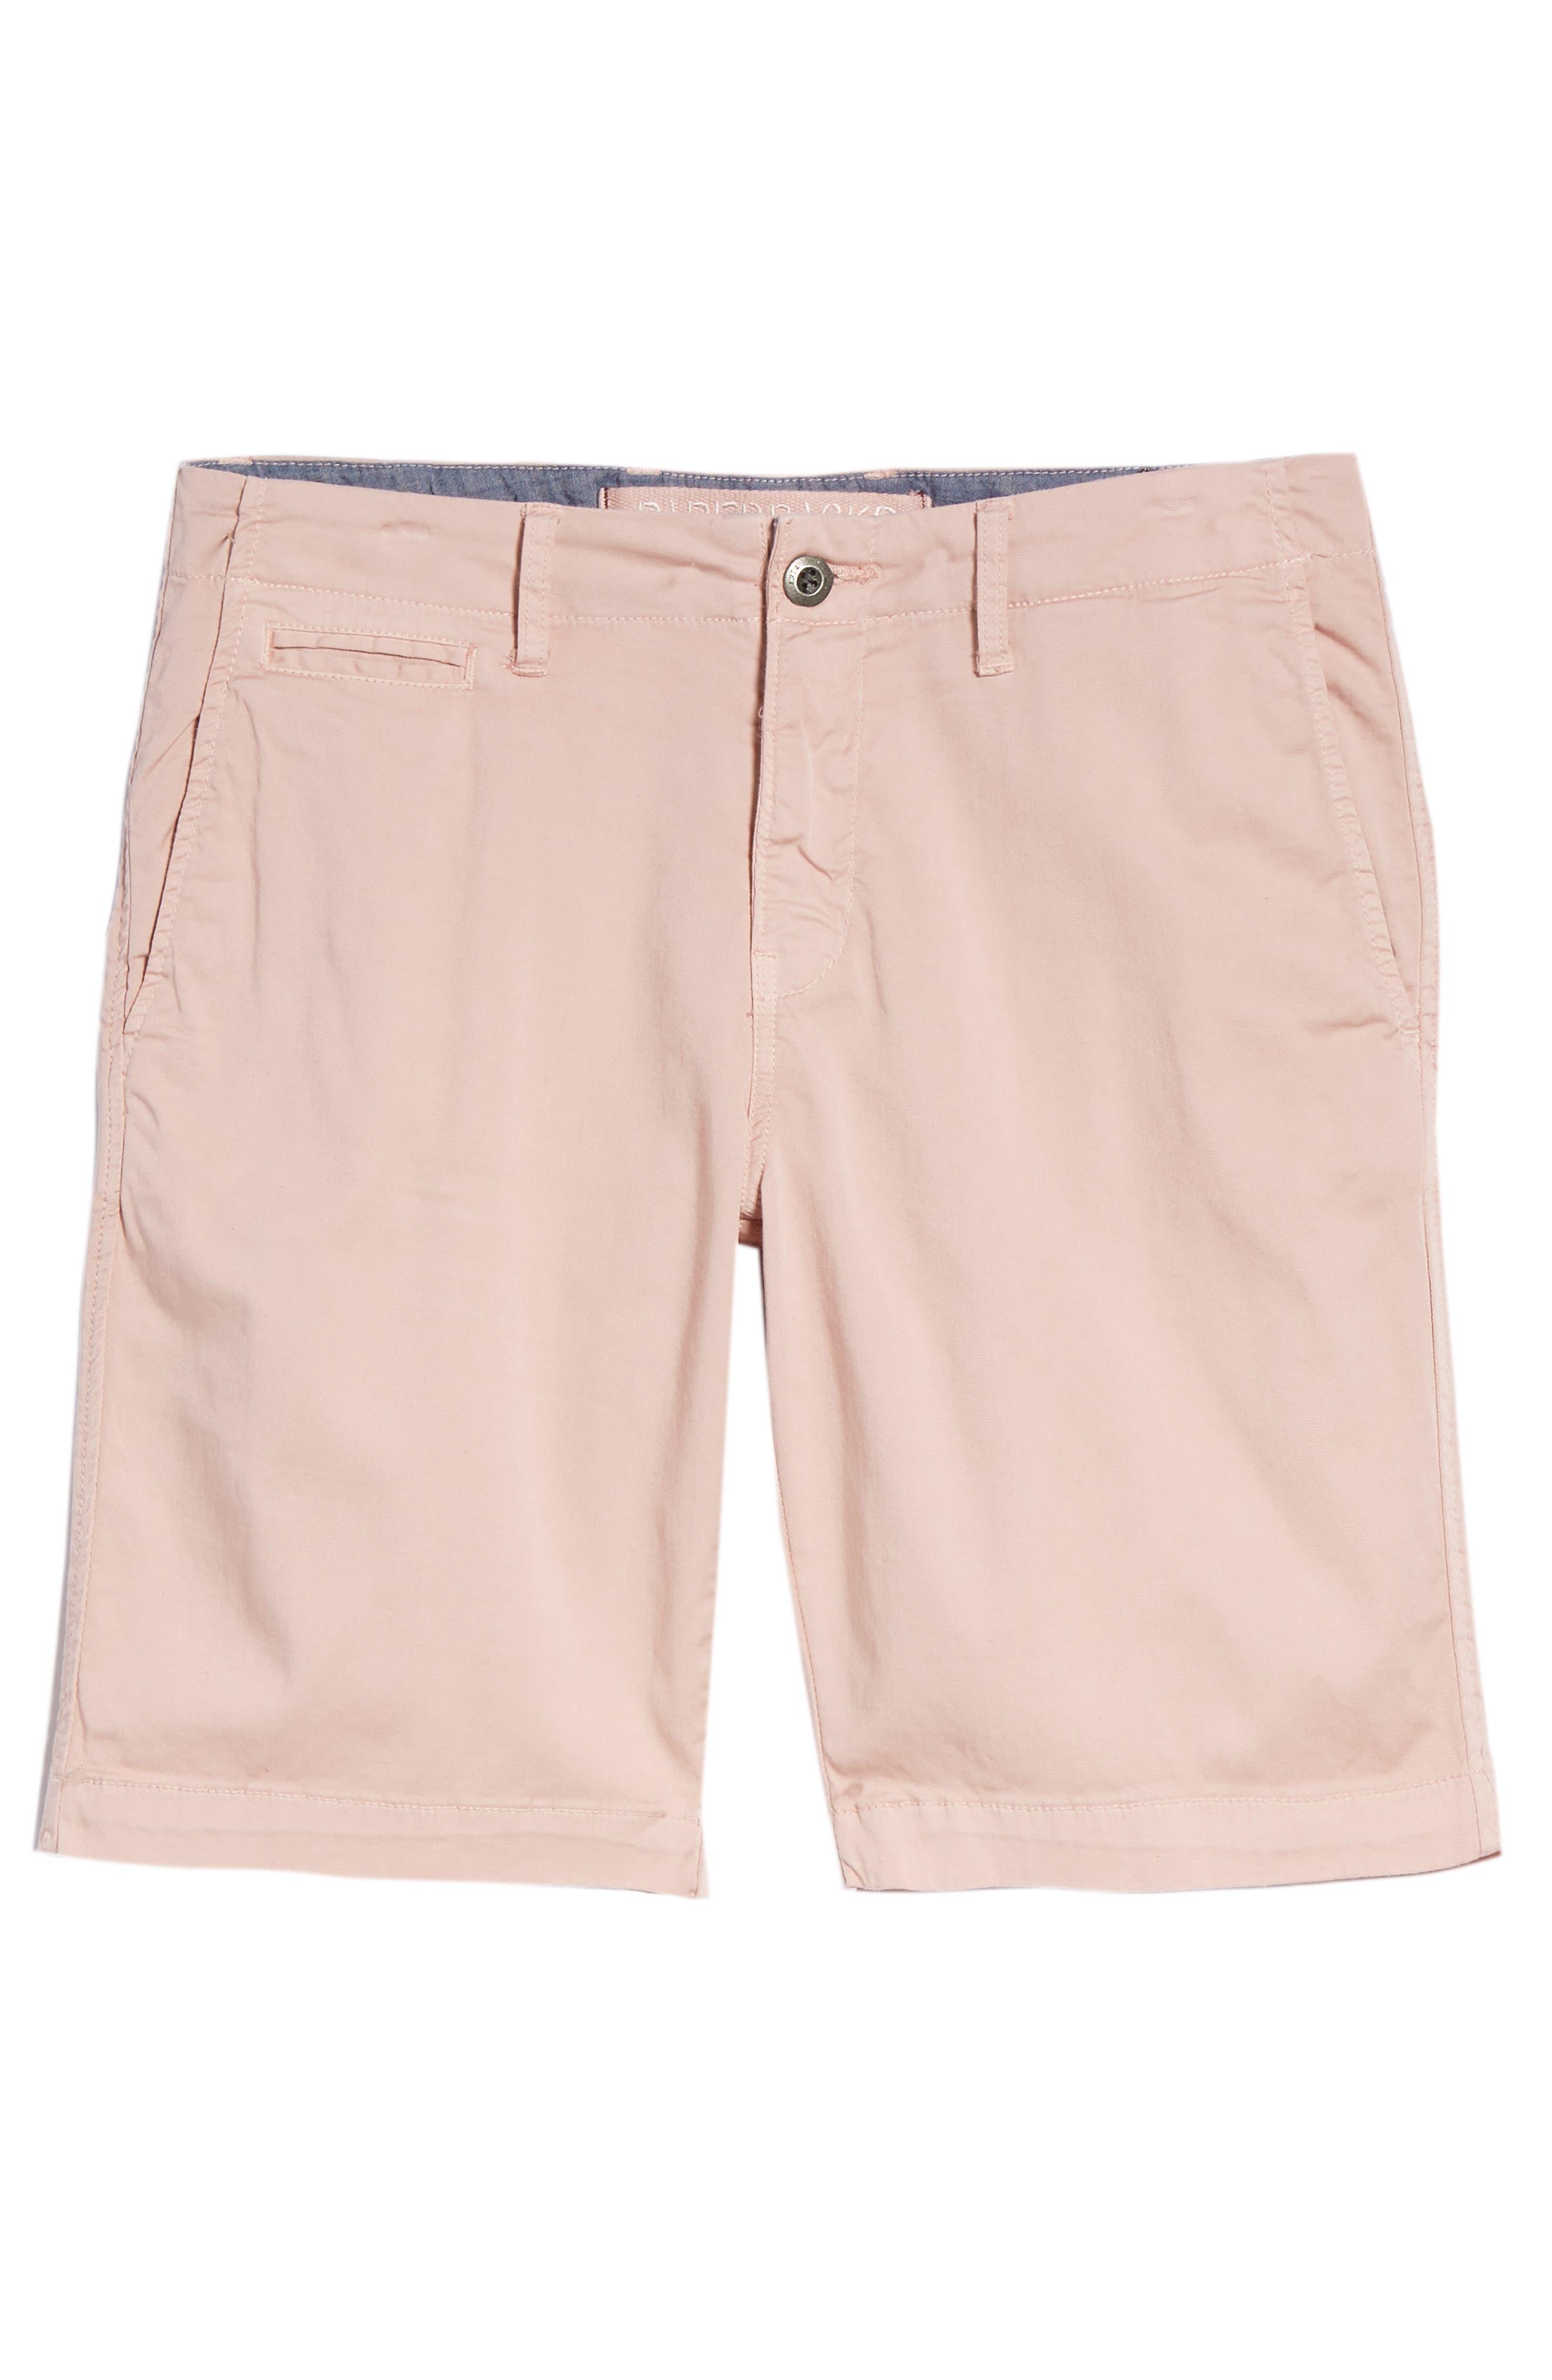 St. Barts Twill Shorts,                             Alternate thumbnail 71, color,